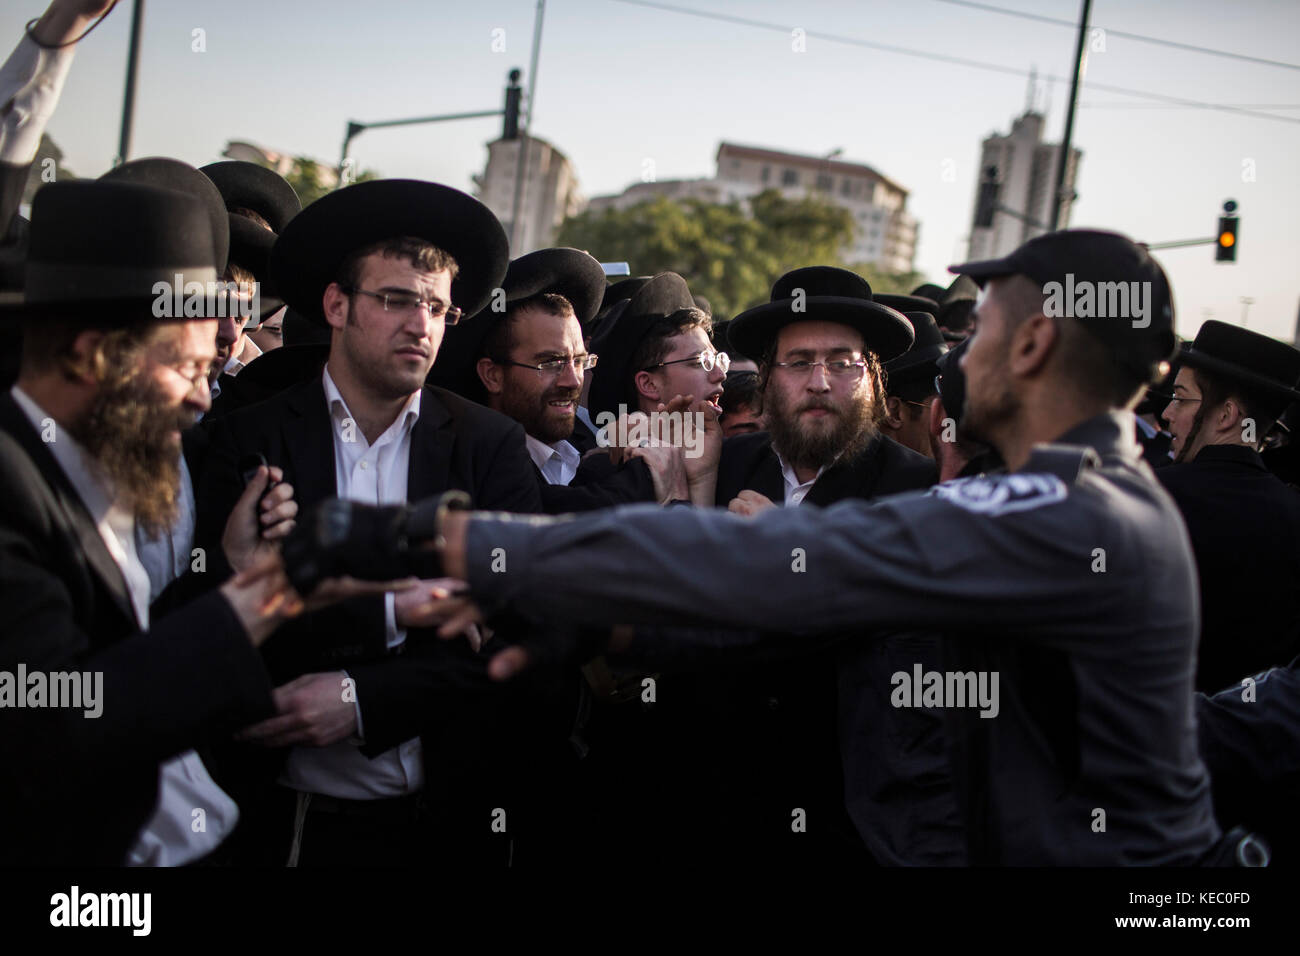 Jerusalem, Israel. 19th Oct, 2017. Ultra Orthodox Jewish men block a road during a protest in Jerusalem, Israel, - Stock Image